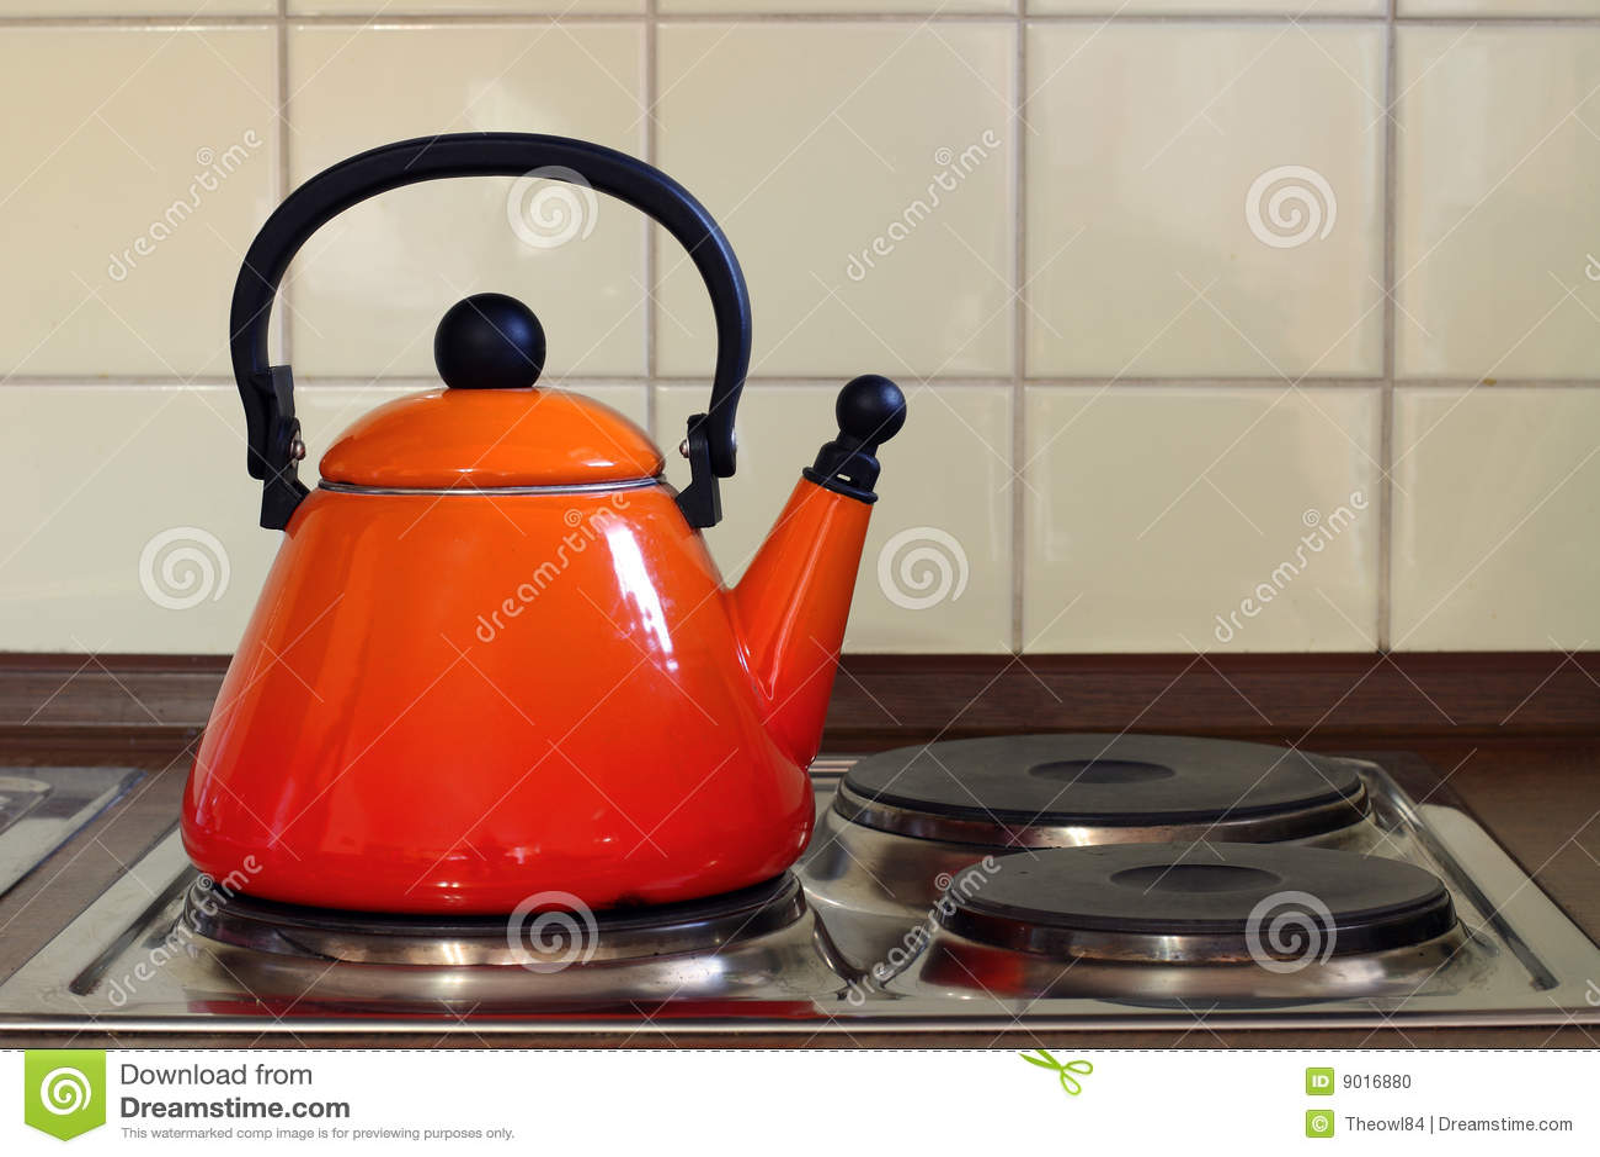 Teapot On Kitchen Oven Stock Photo Image 9016880